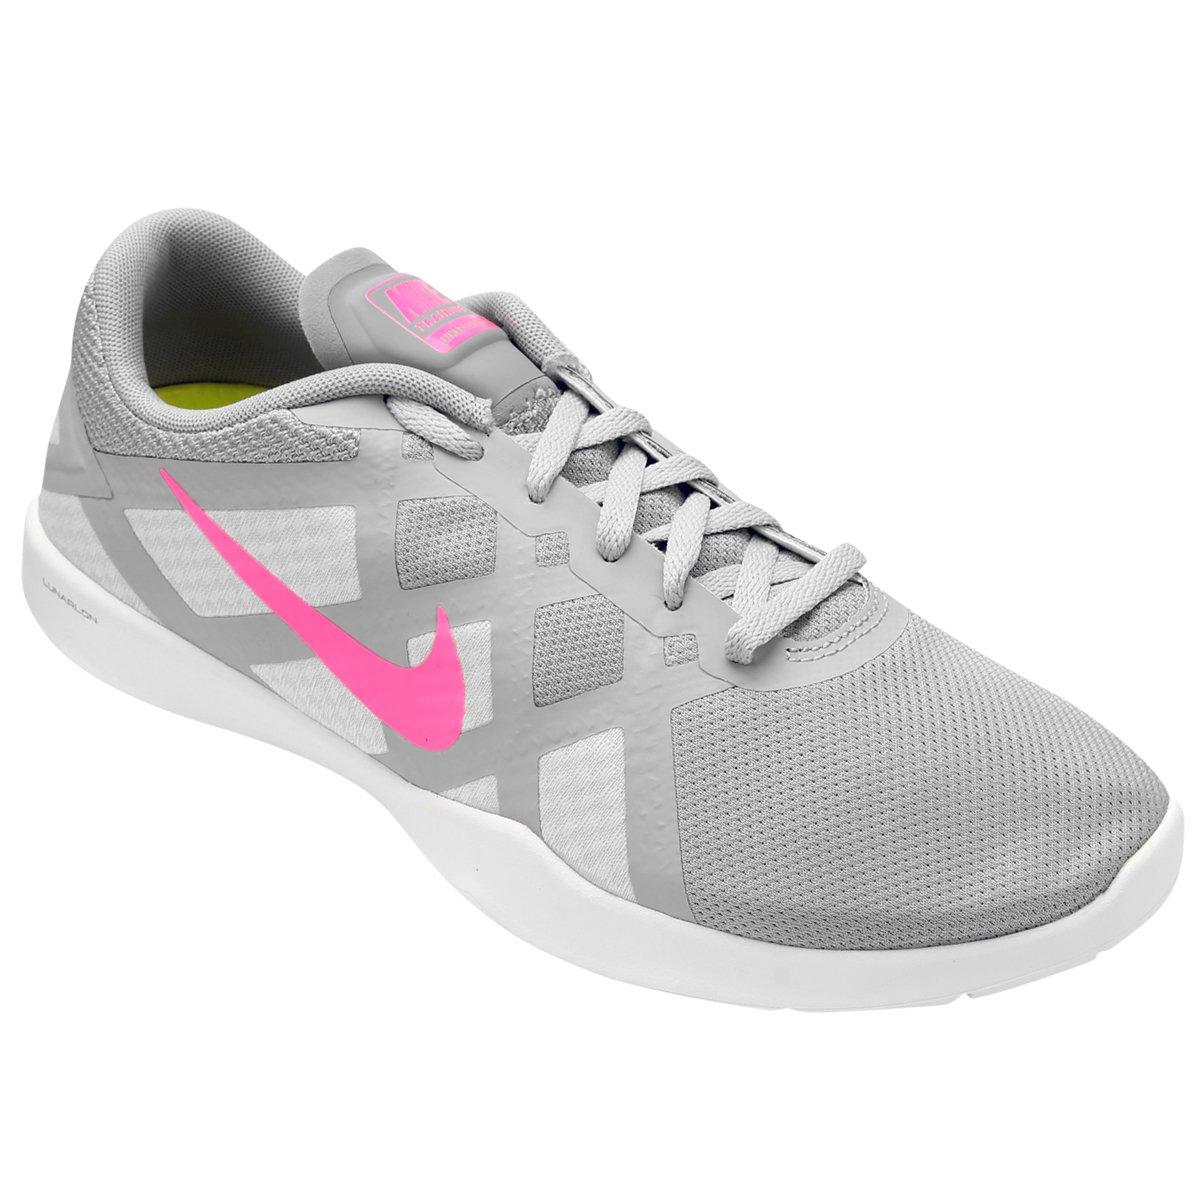 a7e29fb0bf4 Tênis Nike Season Tr Mid Feminino - Compre Agora